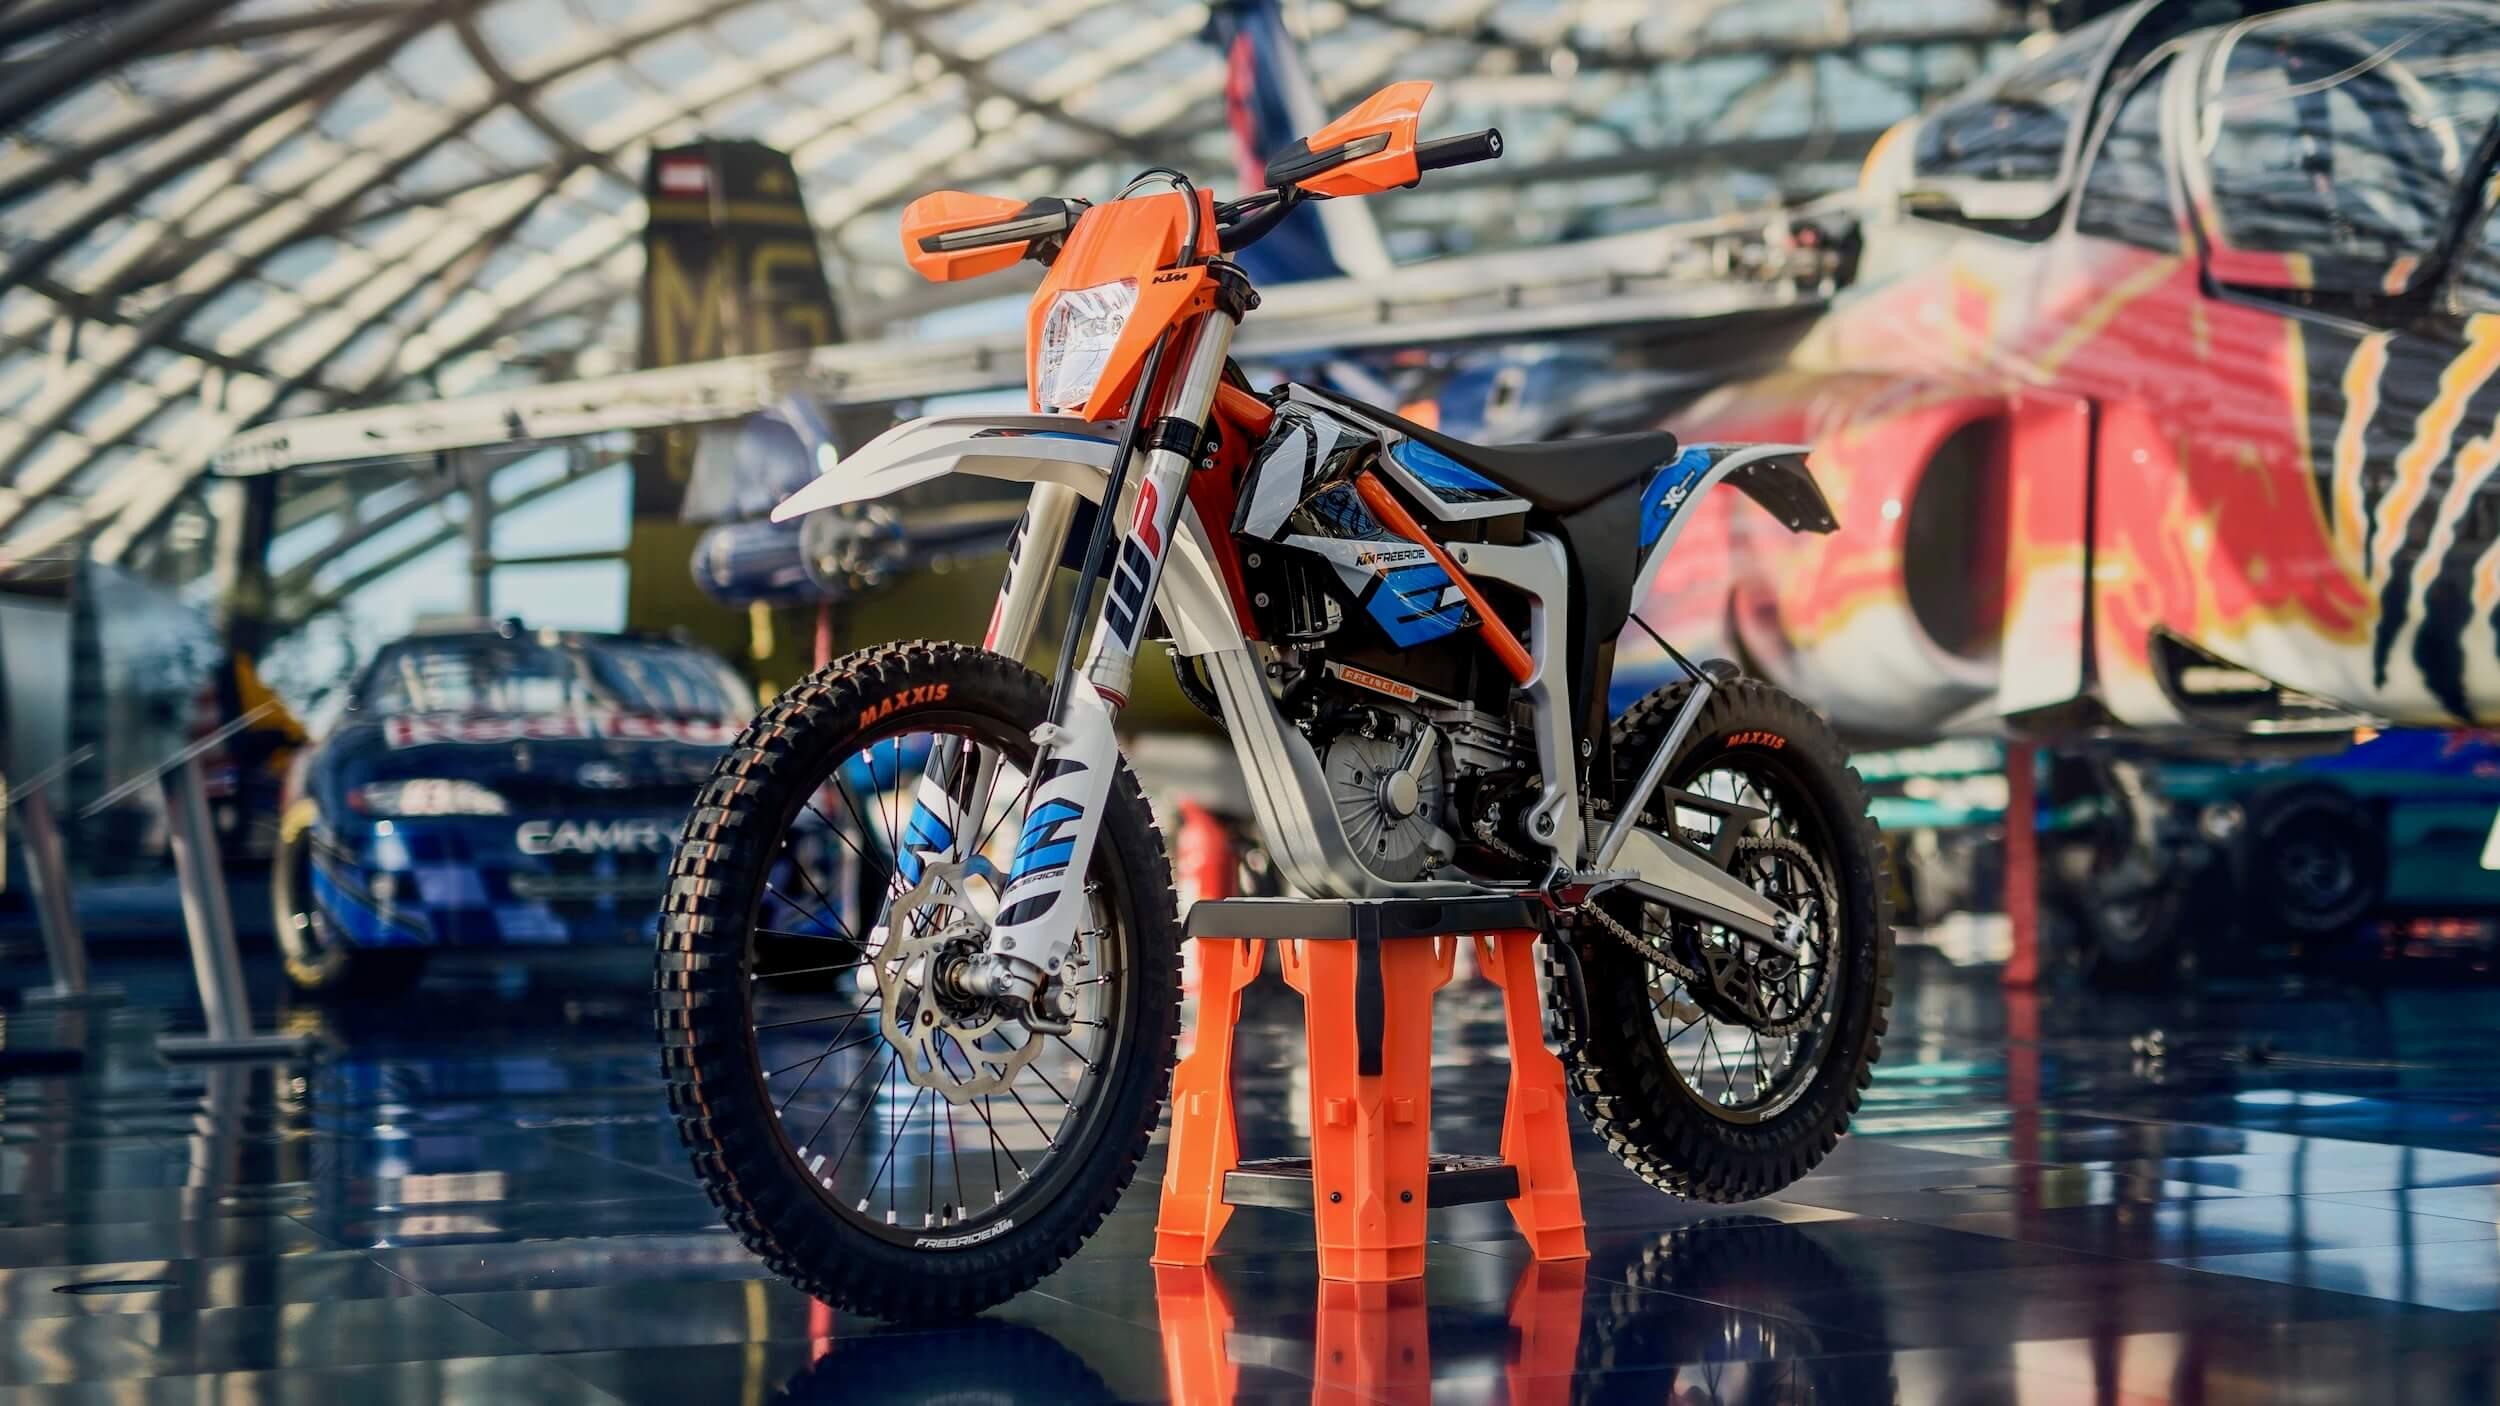 2020 KTM Freeride E-XC elektrische moto